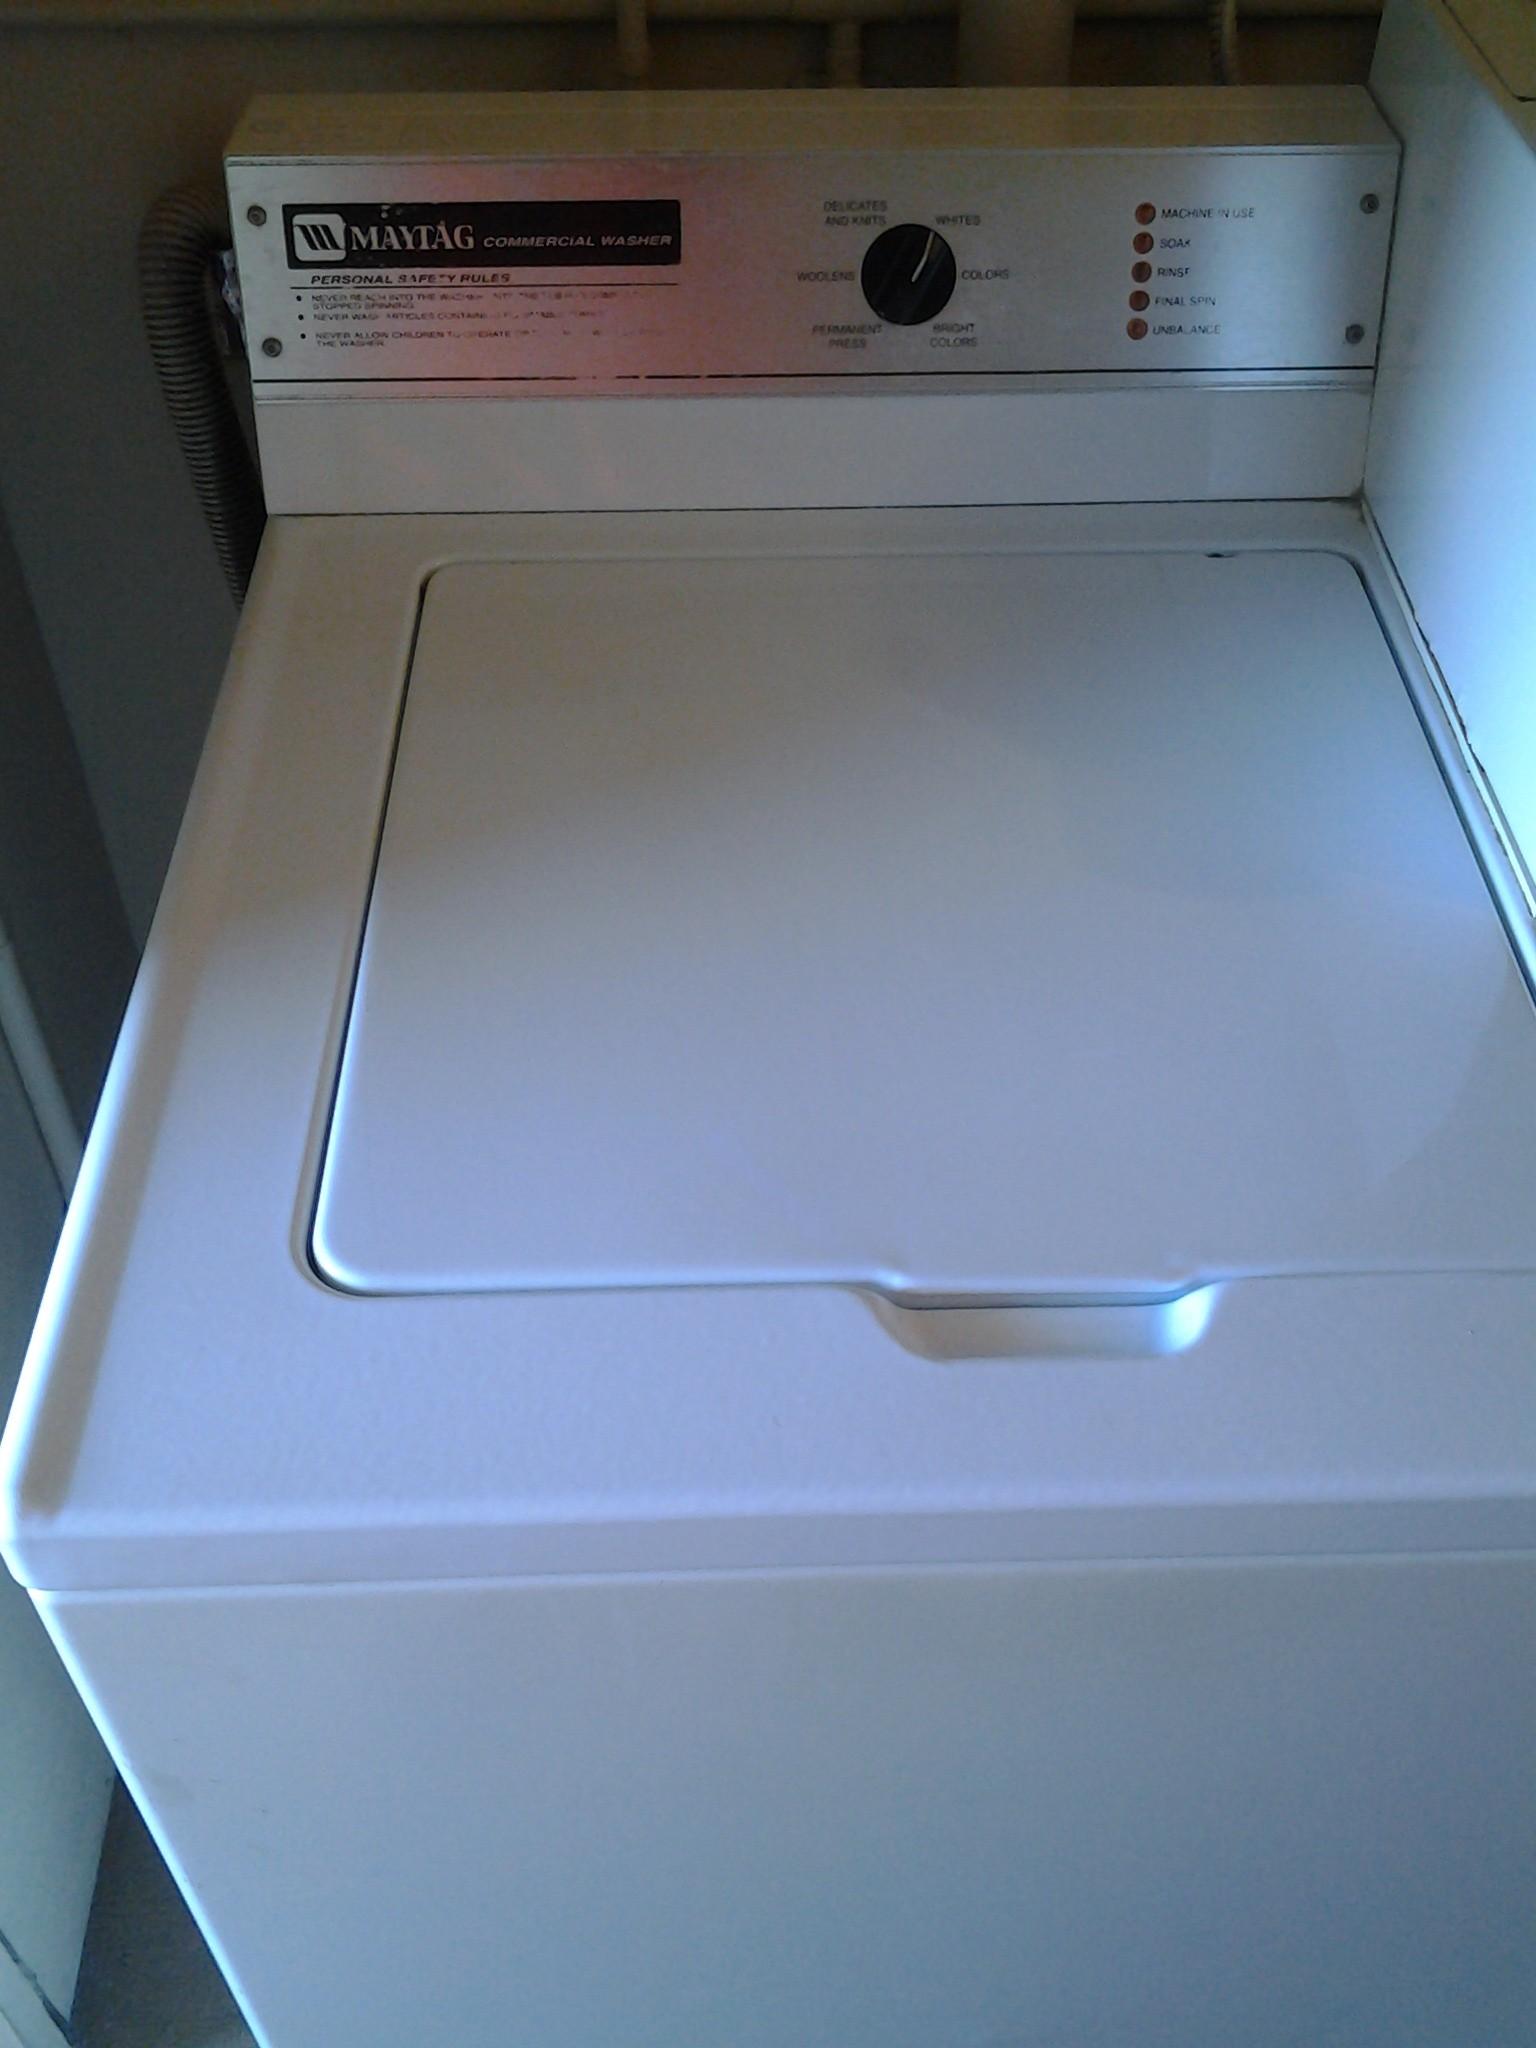 washing machine problem